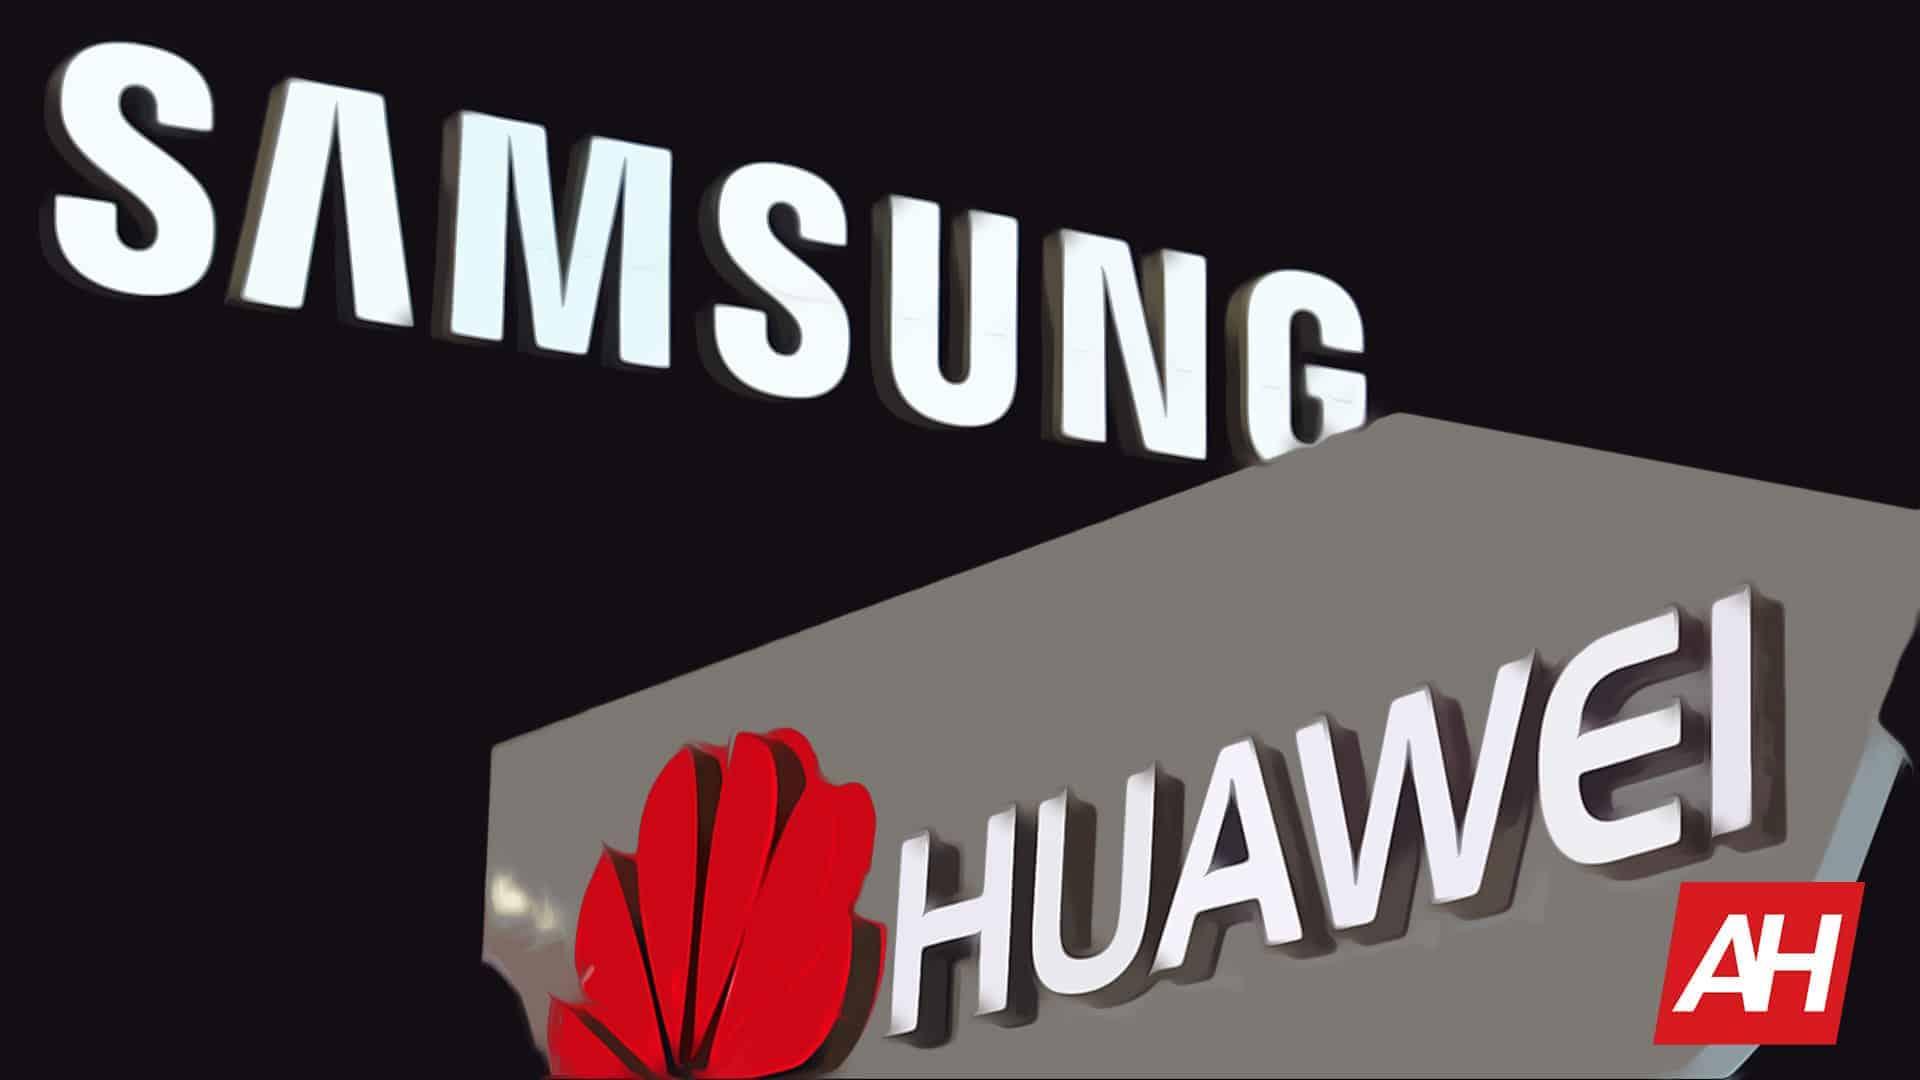 Samsung Huawei Logos AH New Stylized